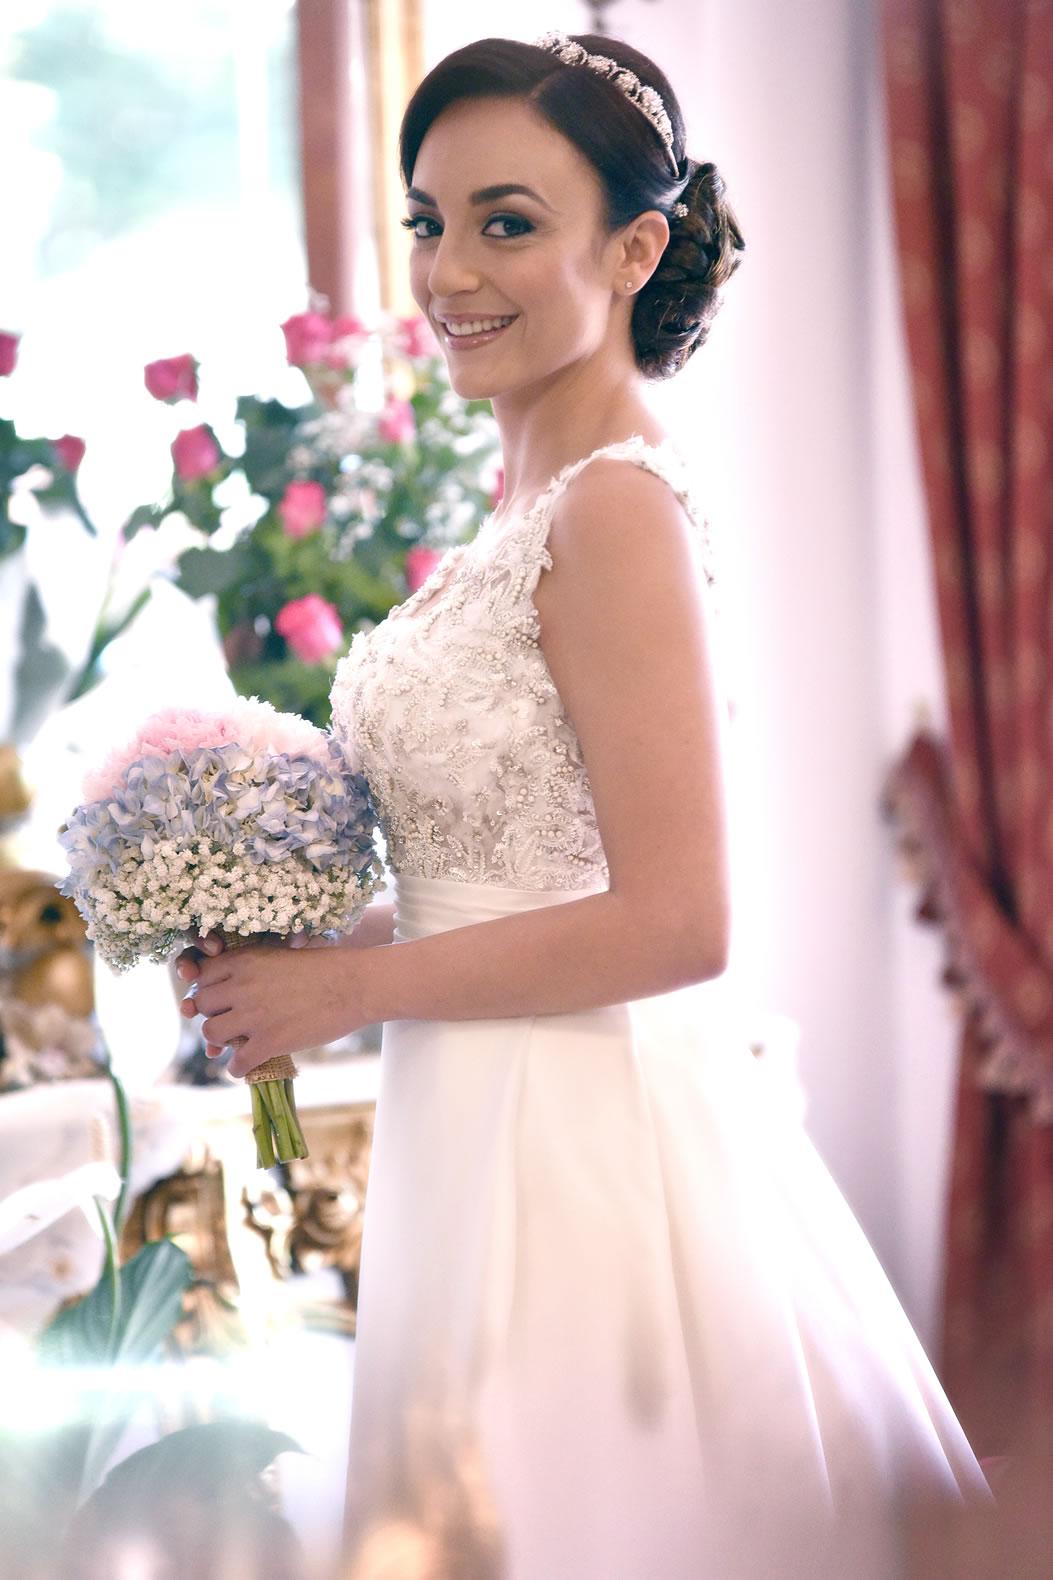 fotografo-matrimonio-napoli-32